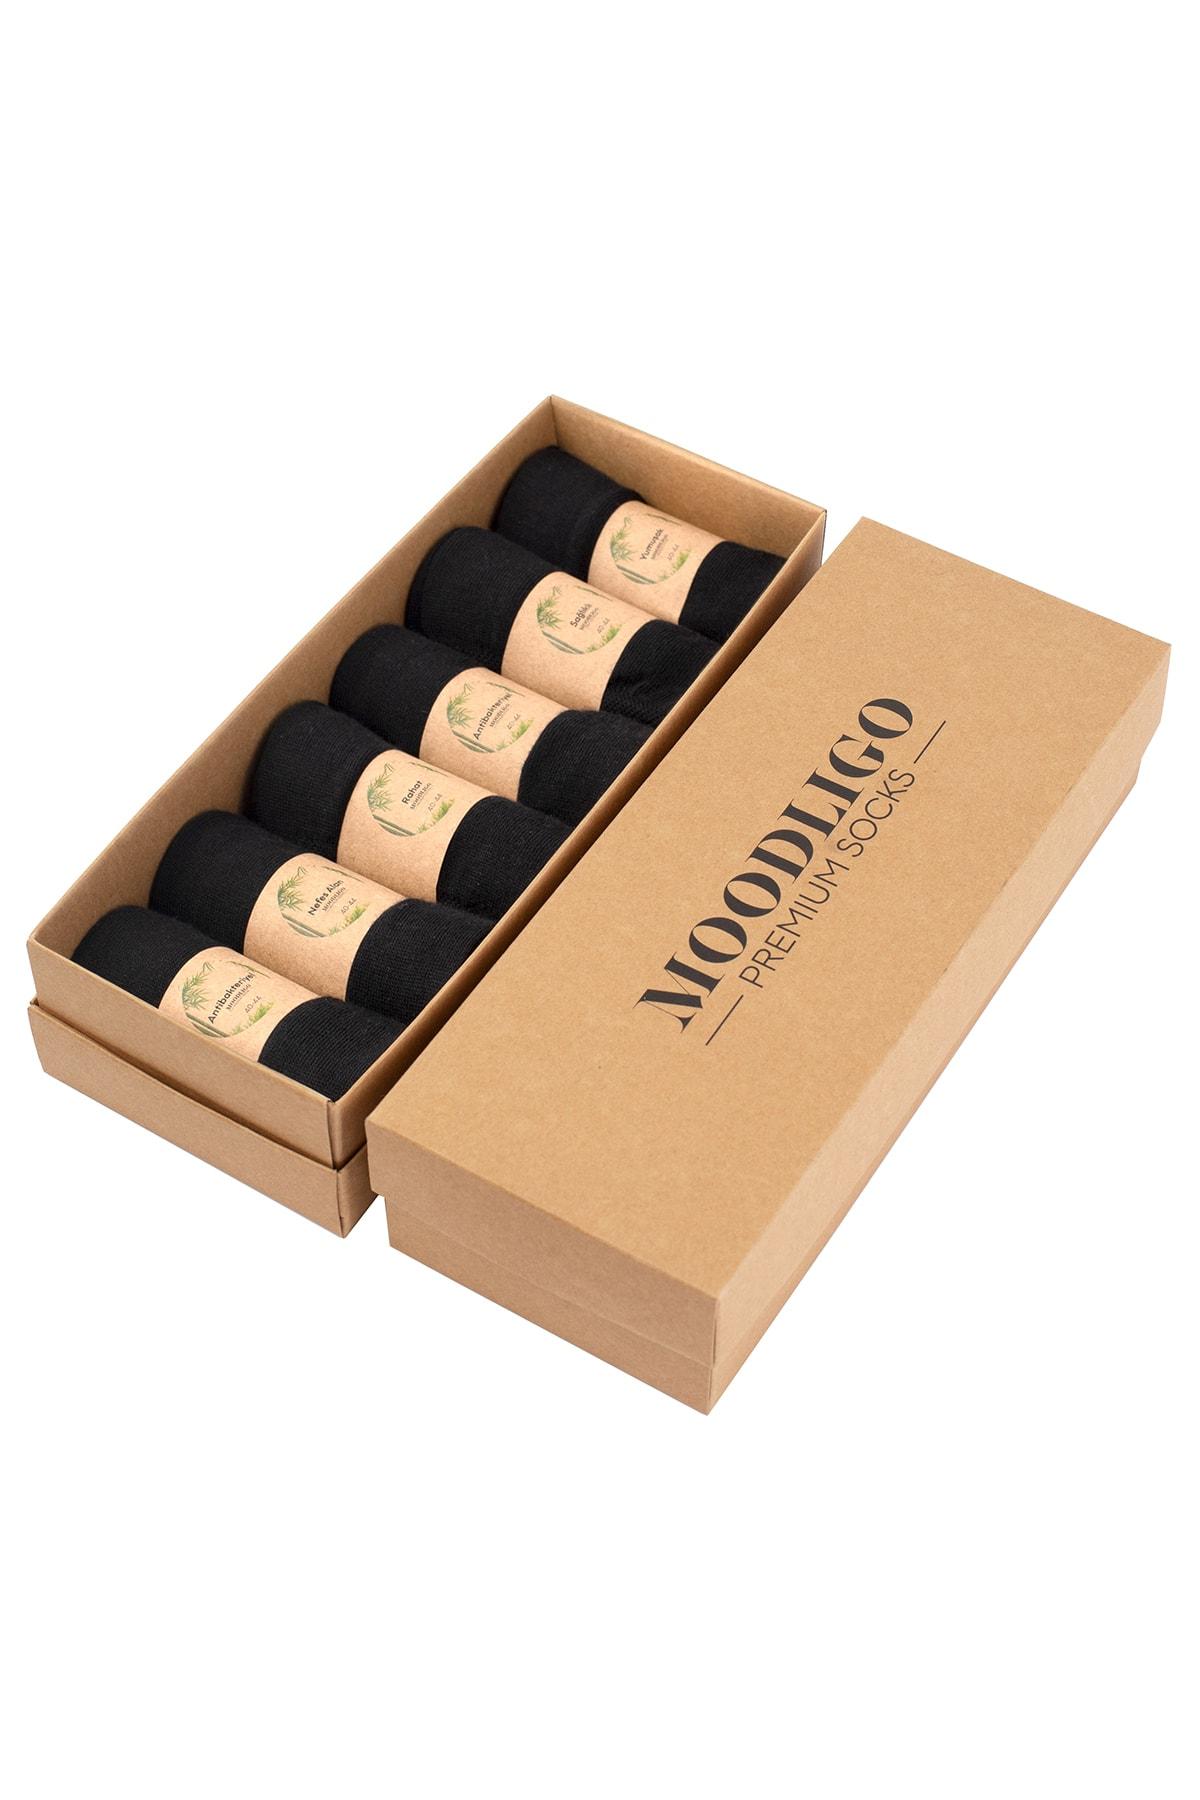 Moodligo Erkek Siyah Premium Bambu Çorap 6 lı 1